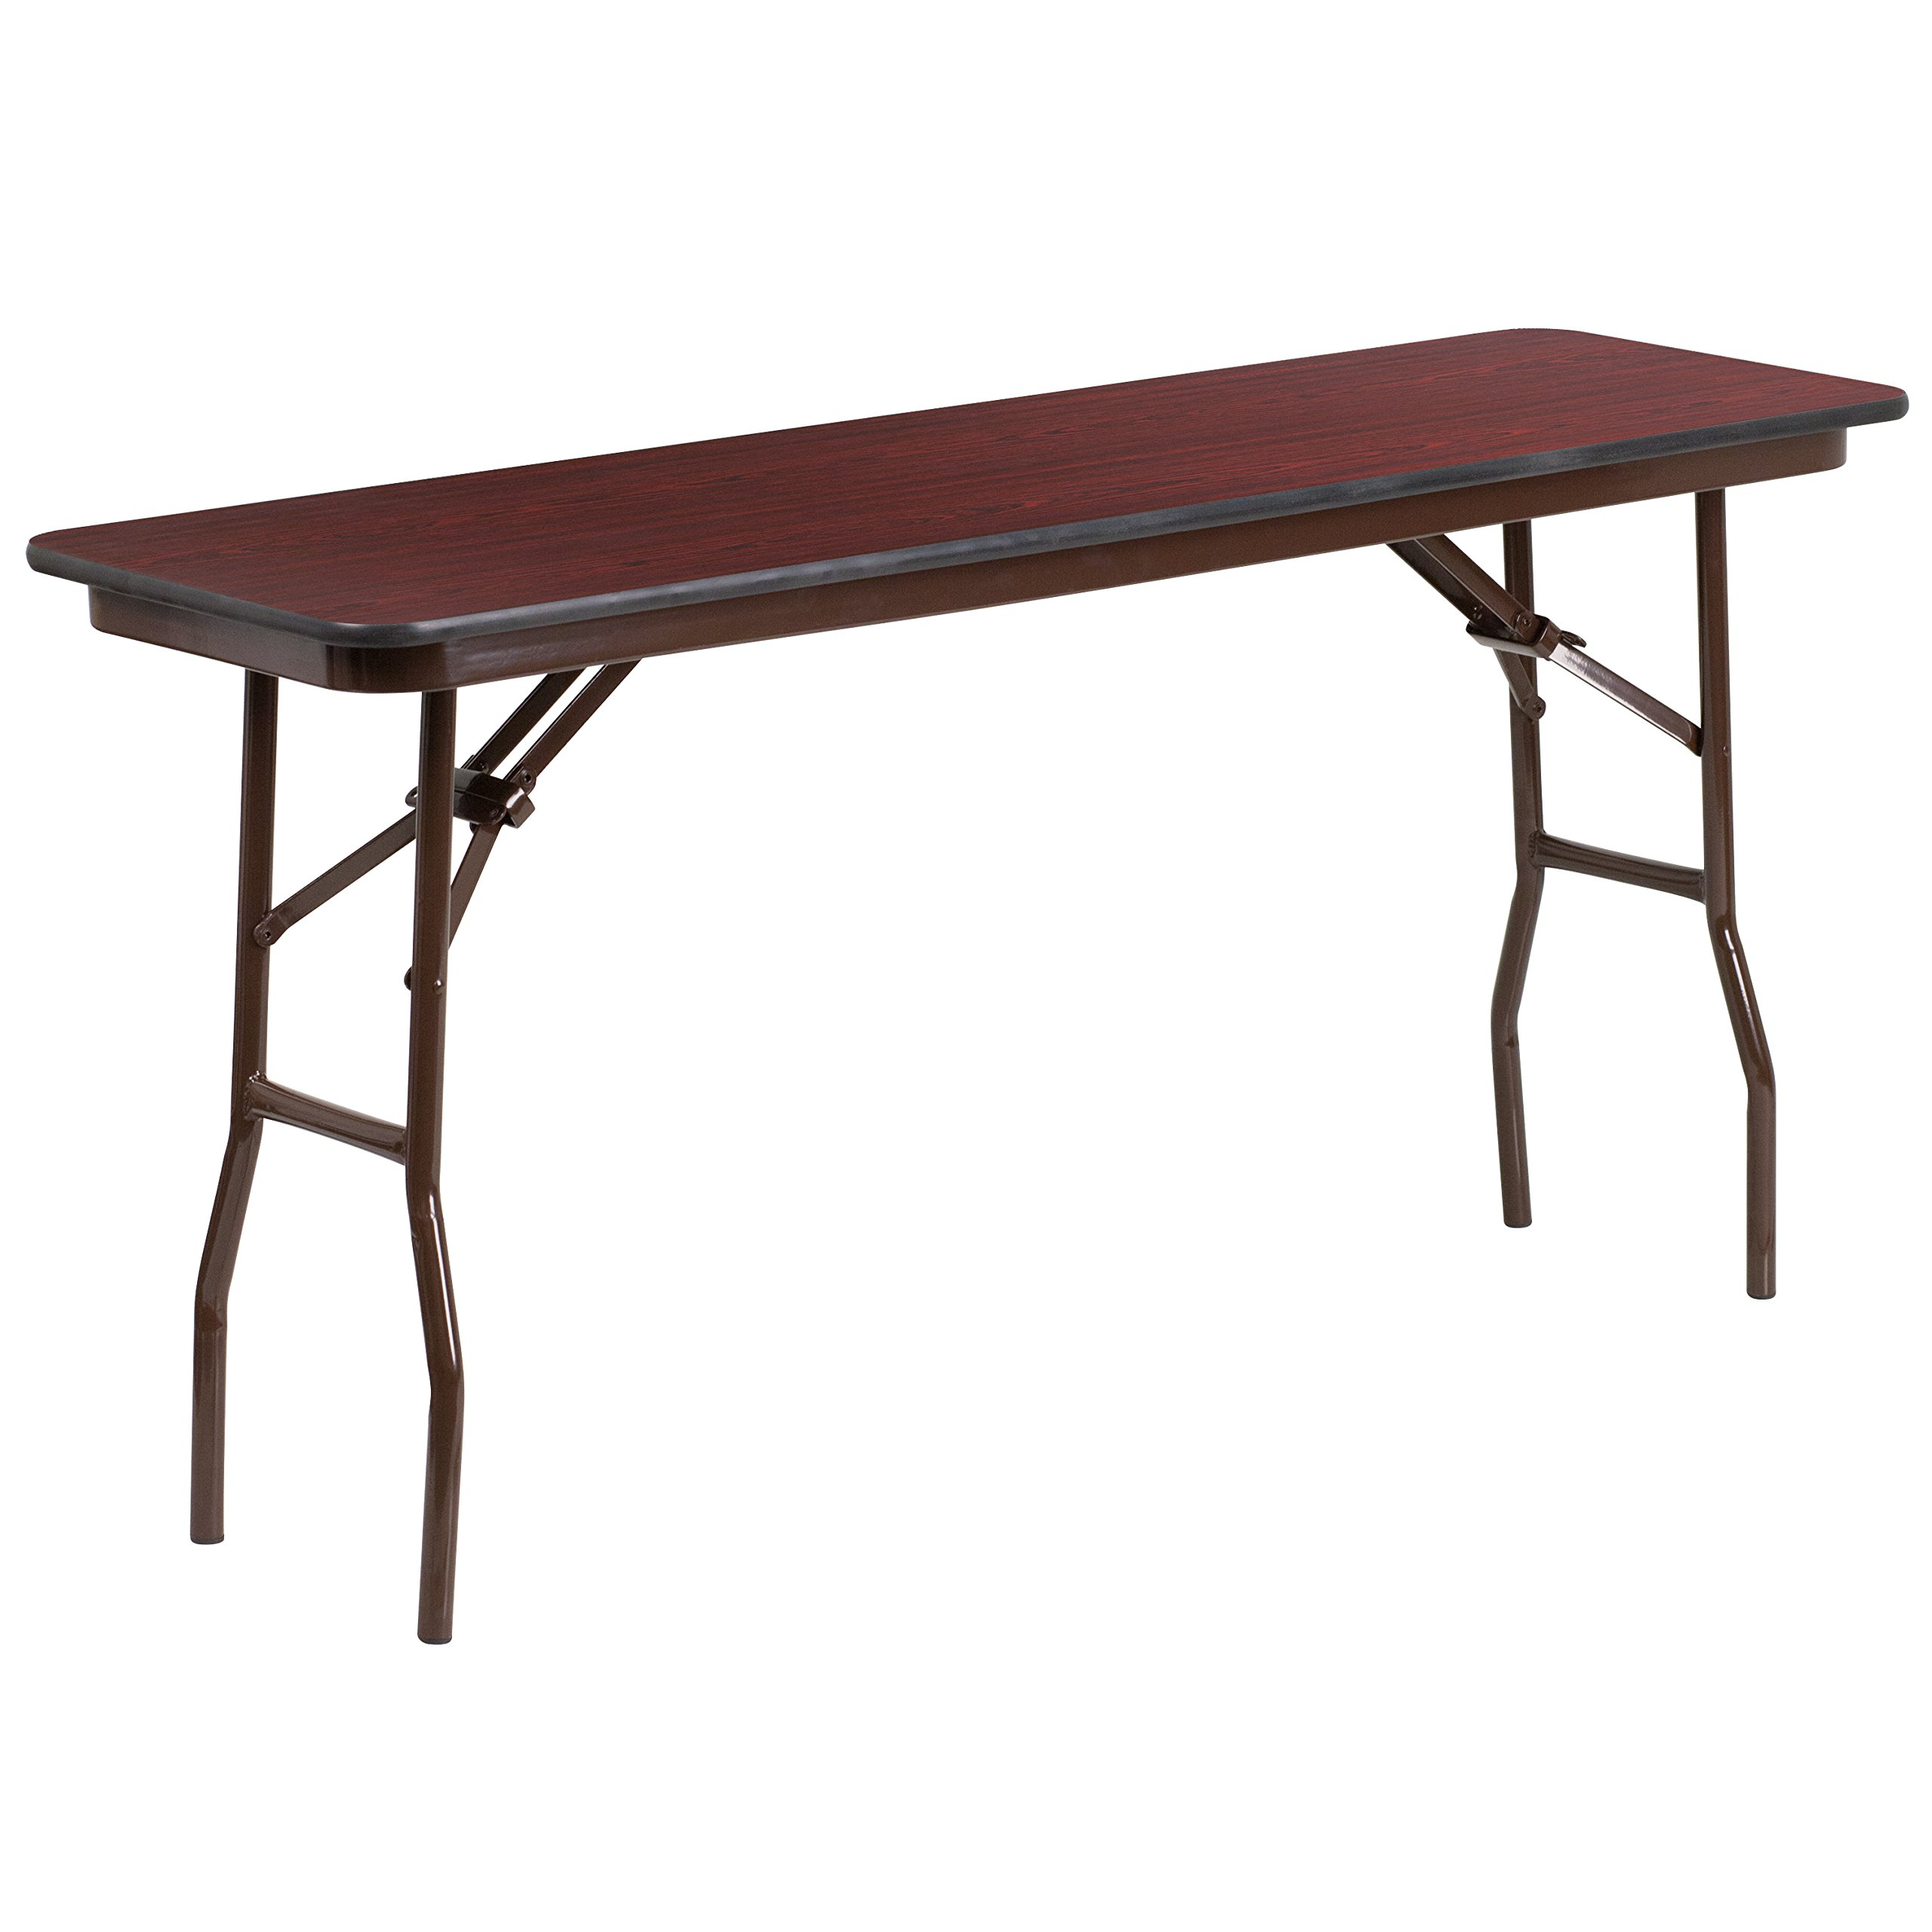 Flash Furniture 18'' x 60'' Rectangular High Pressure Mahogany Laminate Folding Training Table